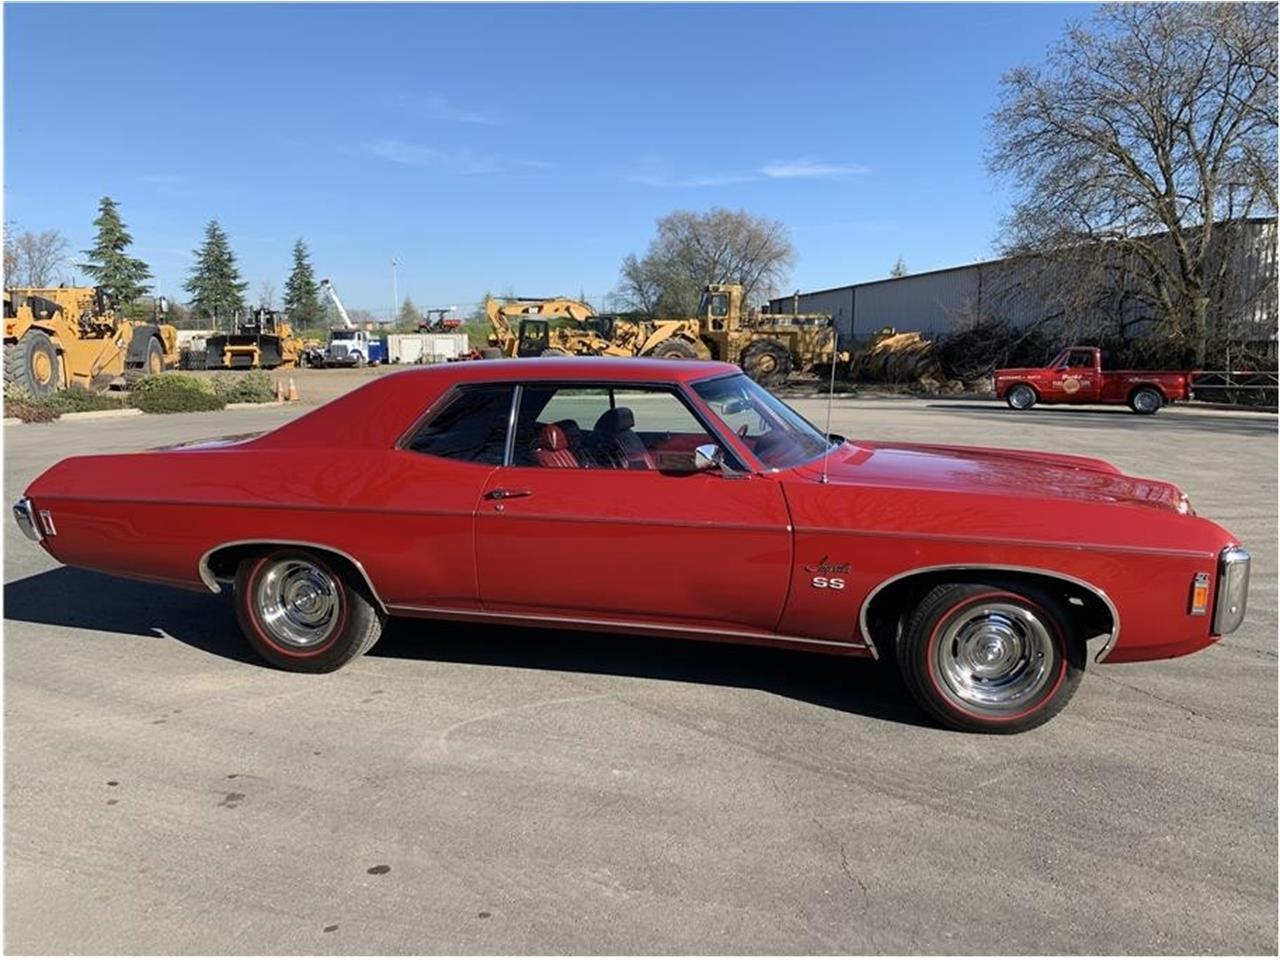 1969 Chevrolet Impala (CC-1329595) for sale in Roseville, California